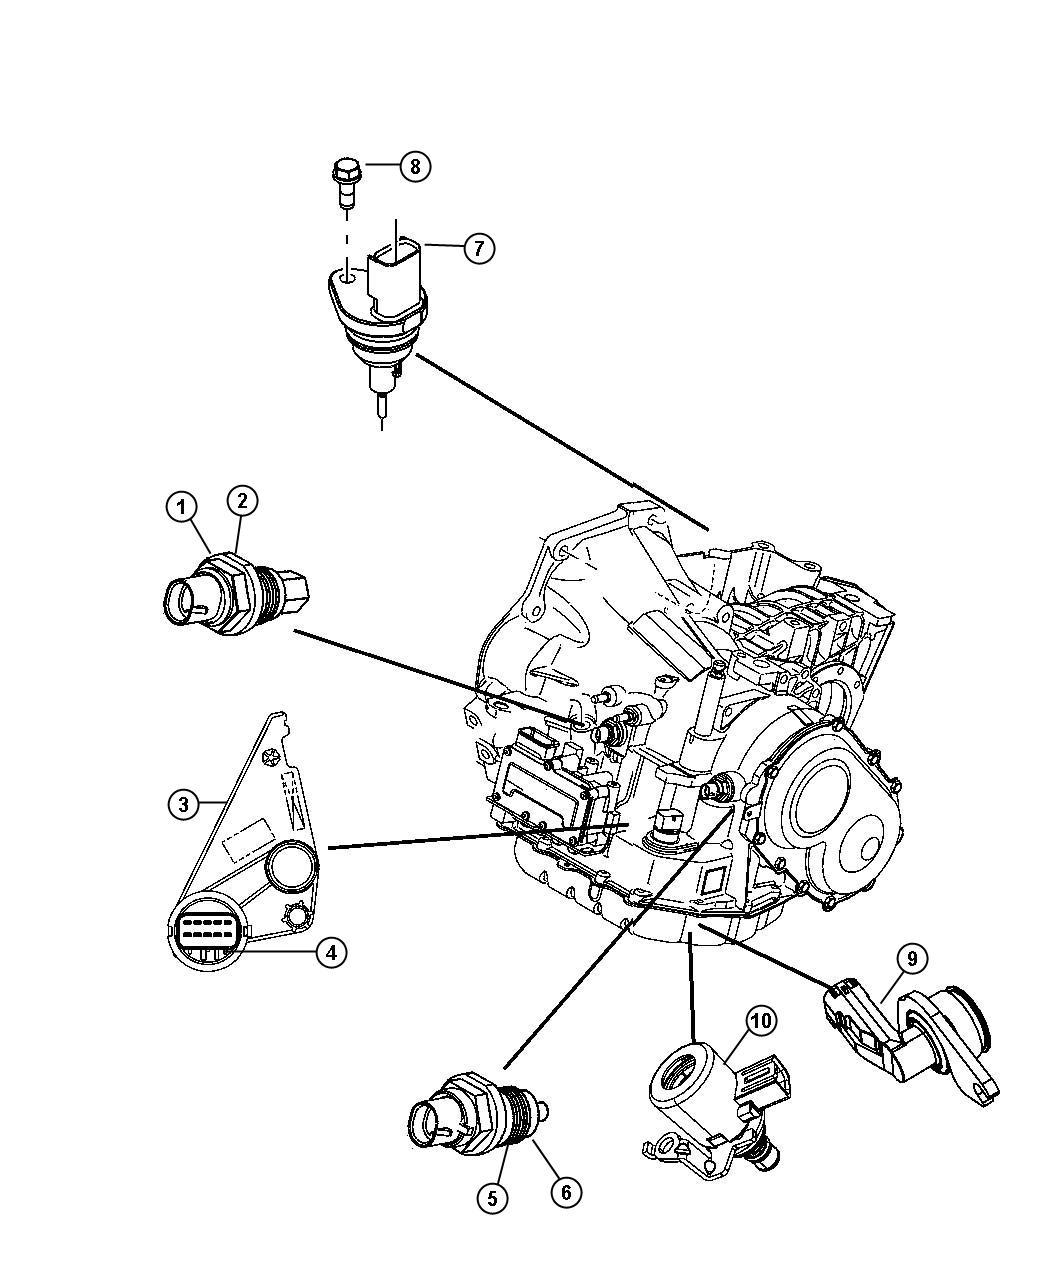 2005 toyota camry sd sensor location  2005  free engine